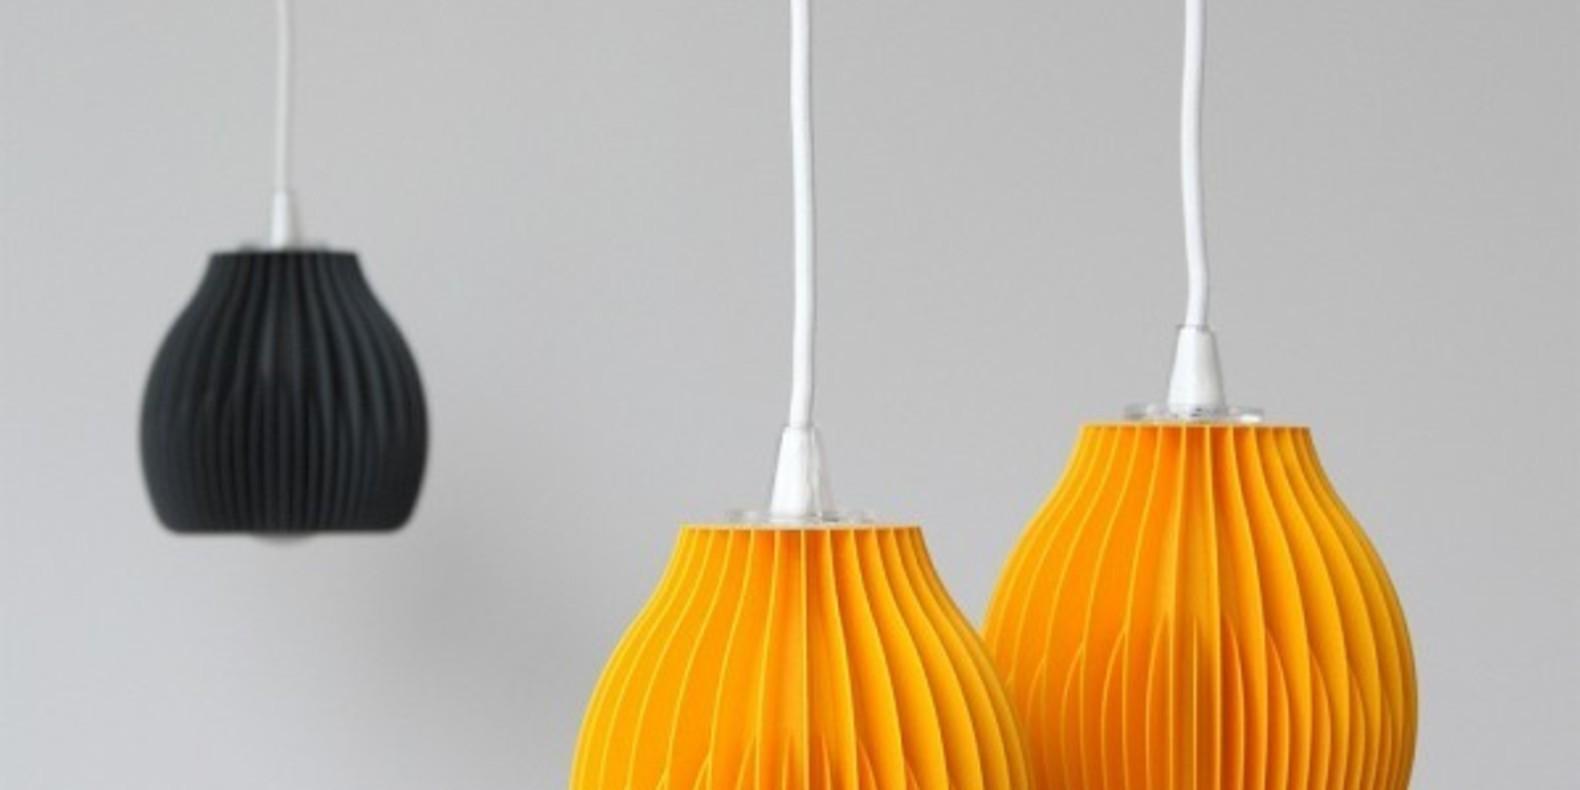 Top 15 Imprimées Des En Cults Lampes 3d・ rdoxCBe